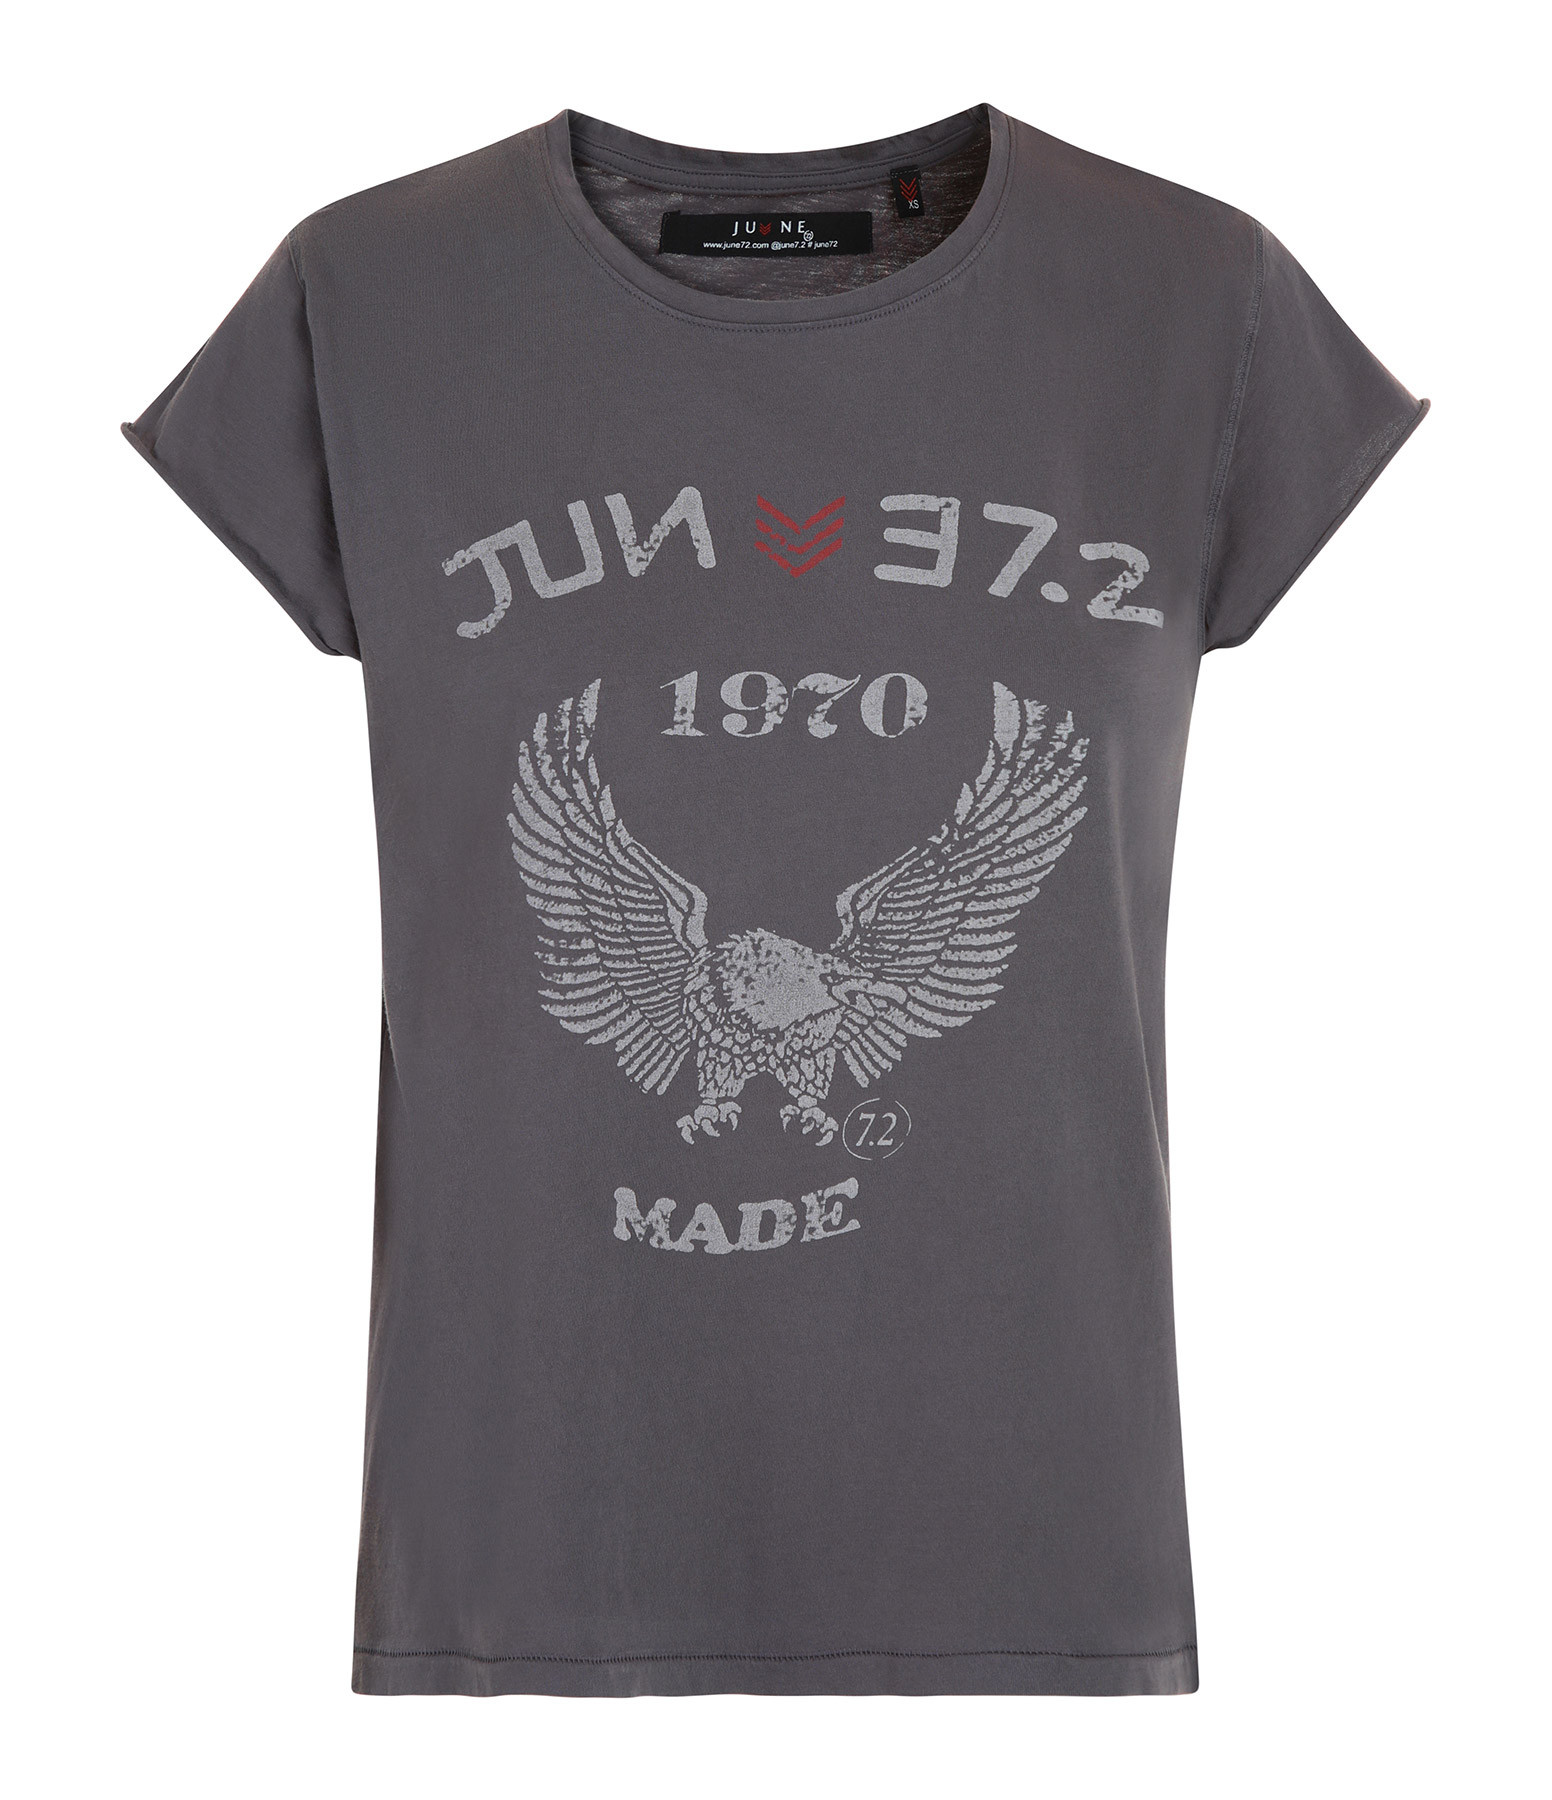 JUNE 7.2 - Tee-shirt Eagle Coton Charbon